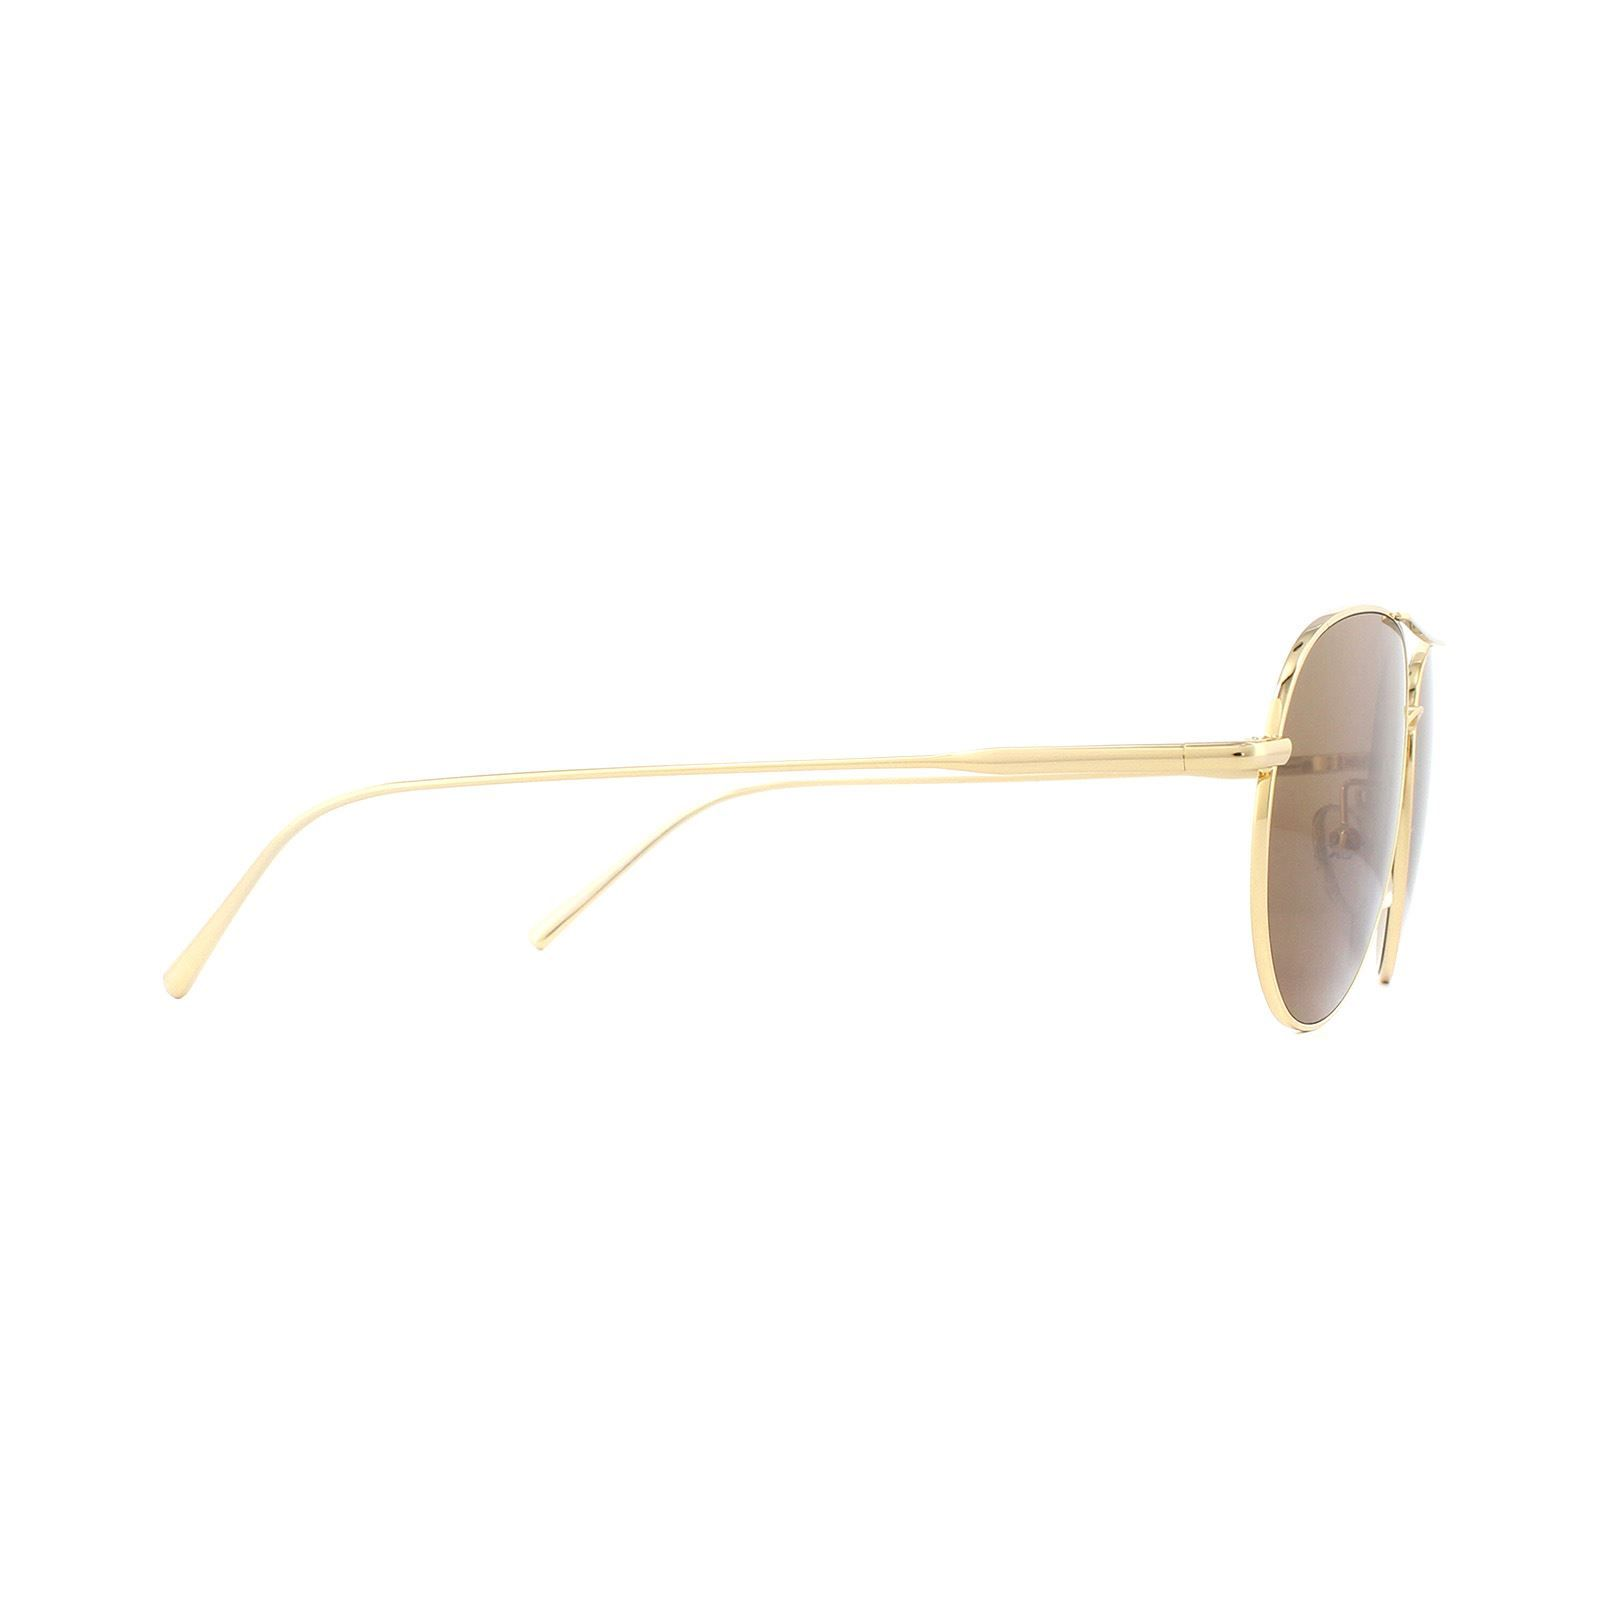 Calvin Klein Sunglasses CK2155S 714 Gold Brown Gold Mirror